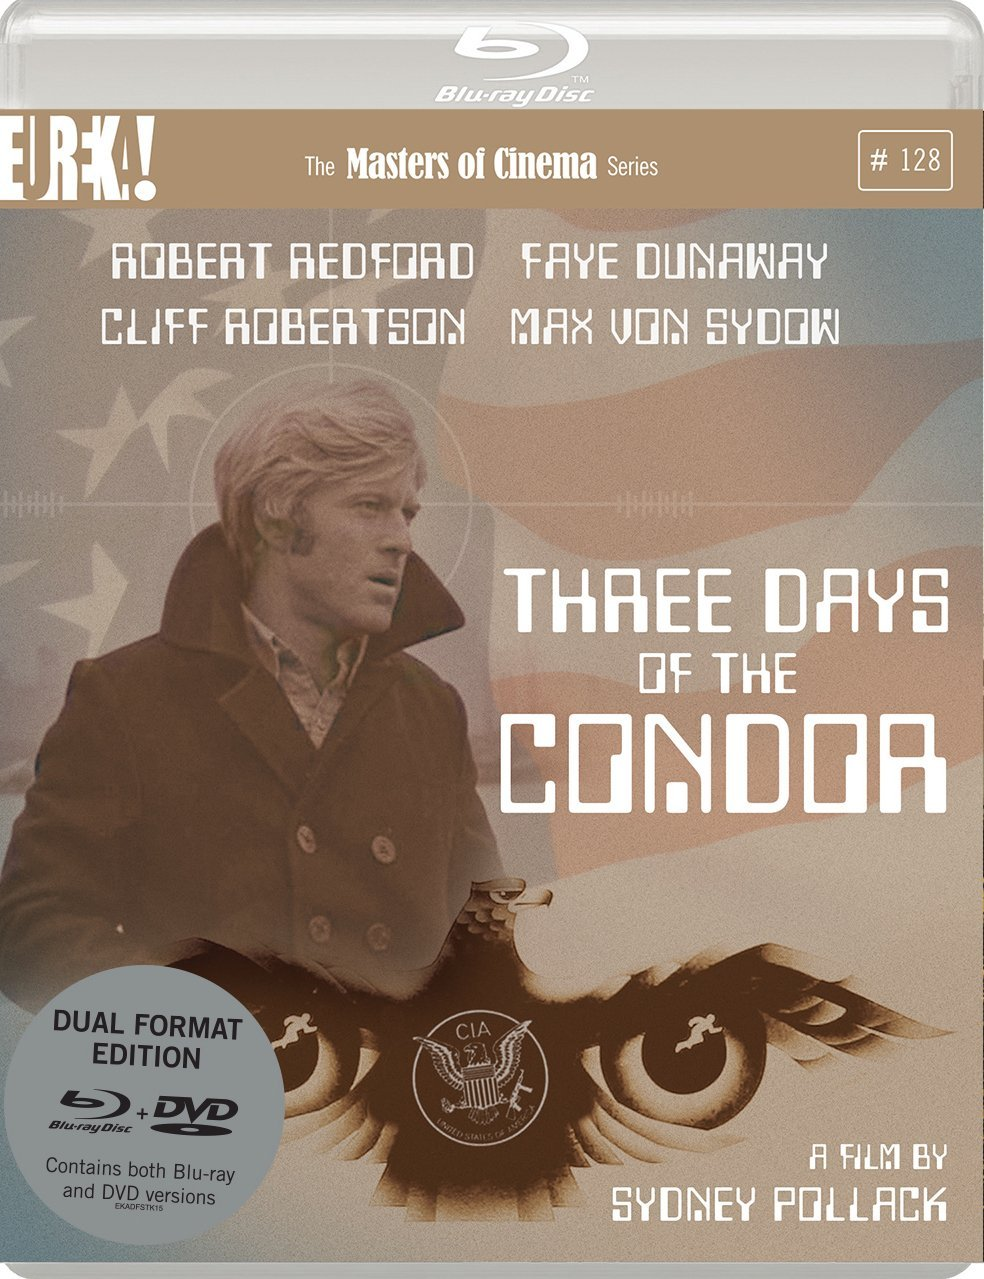 Buy Three Days of the Condor (Dual Format)